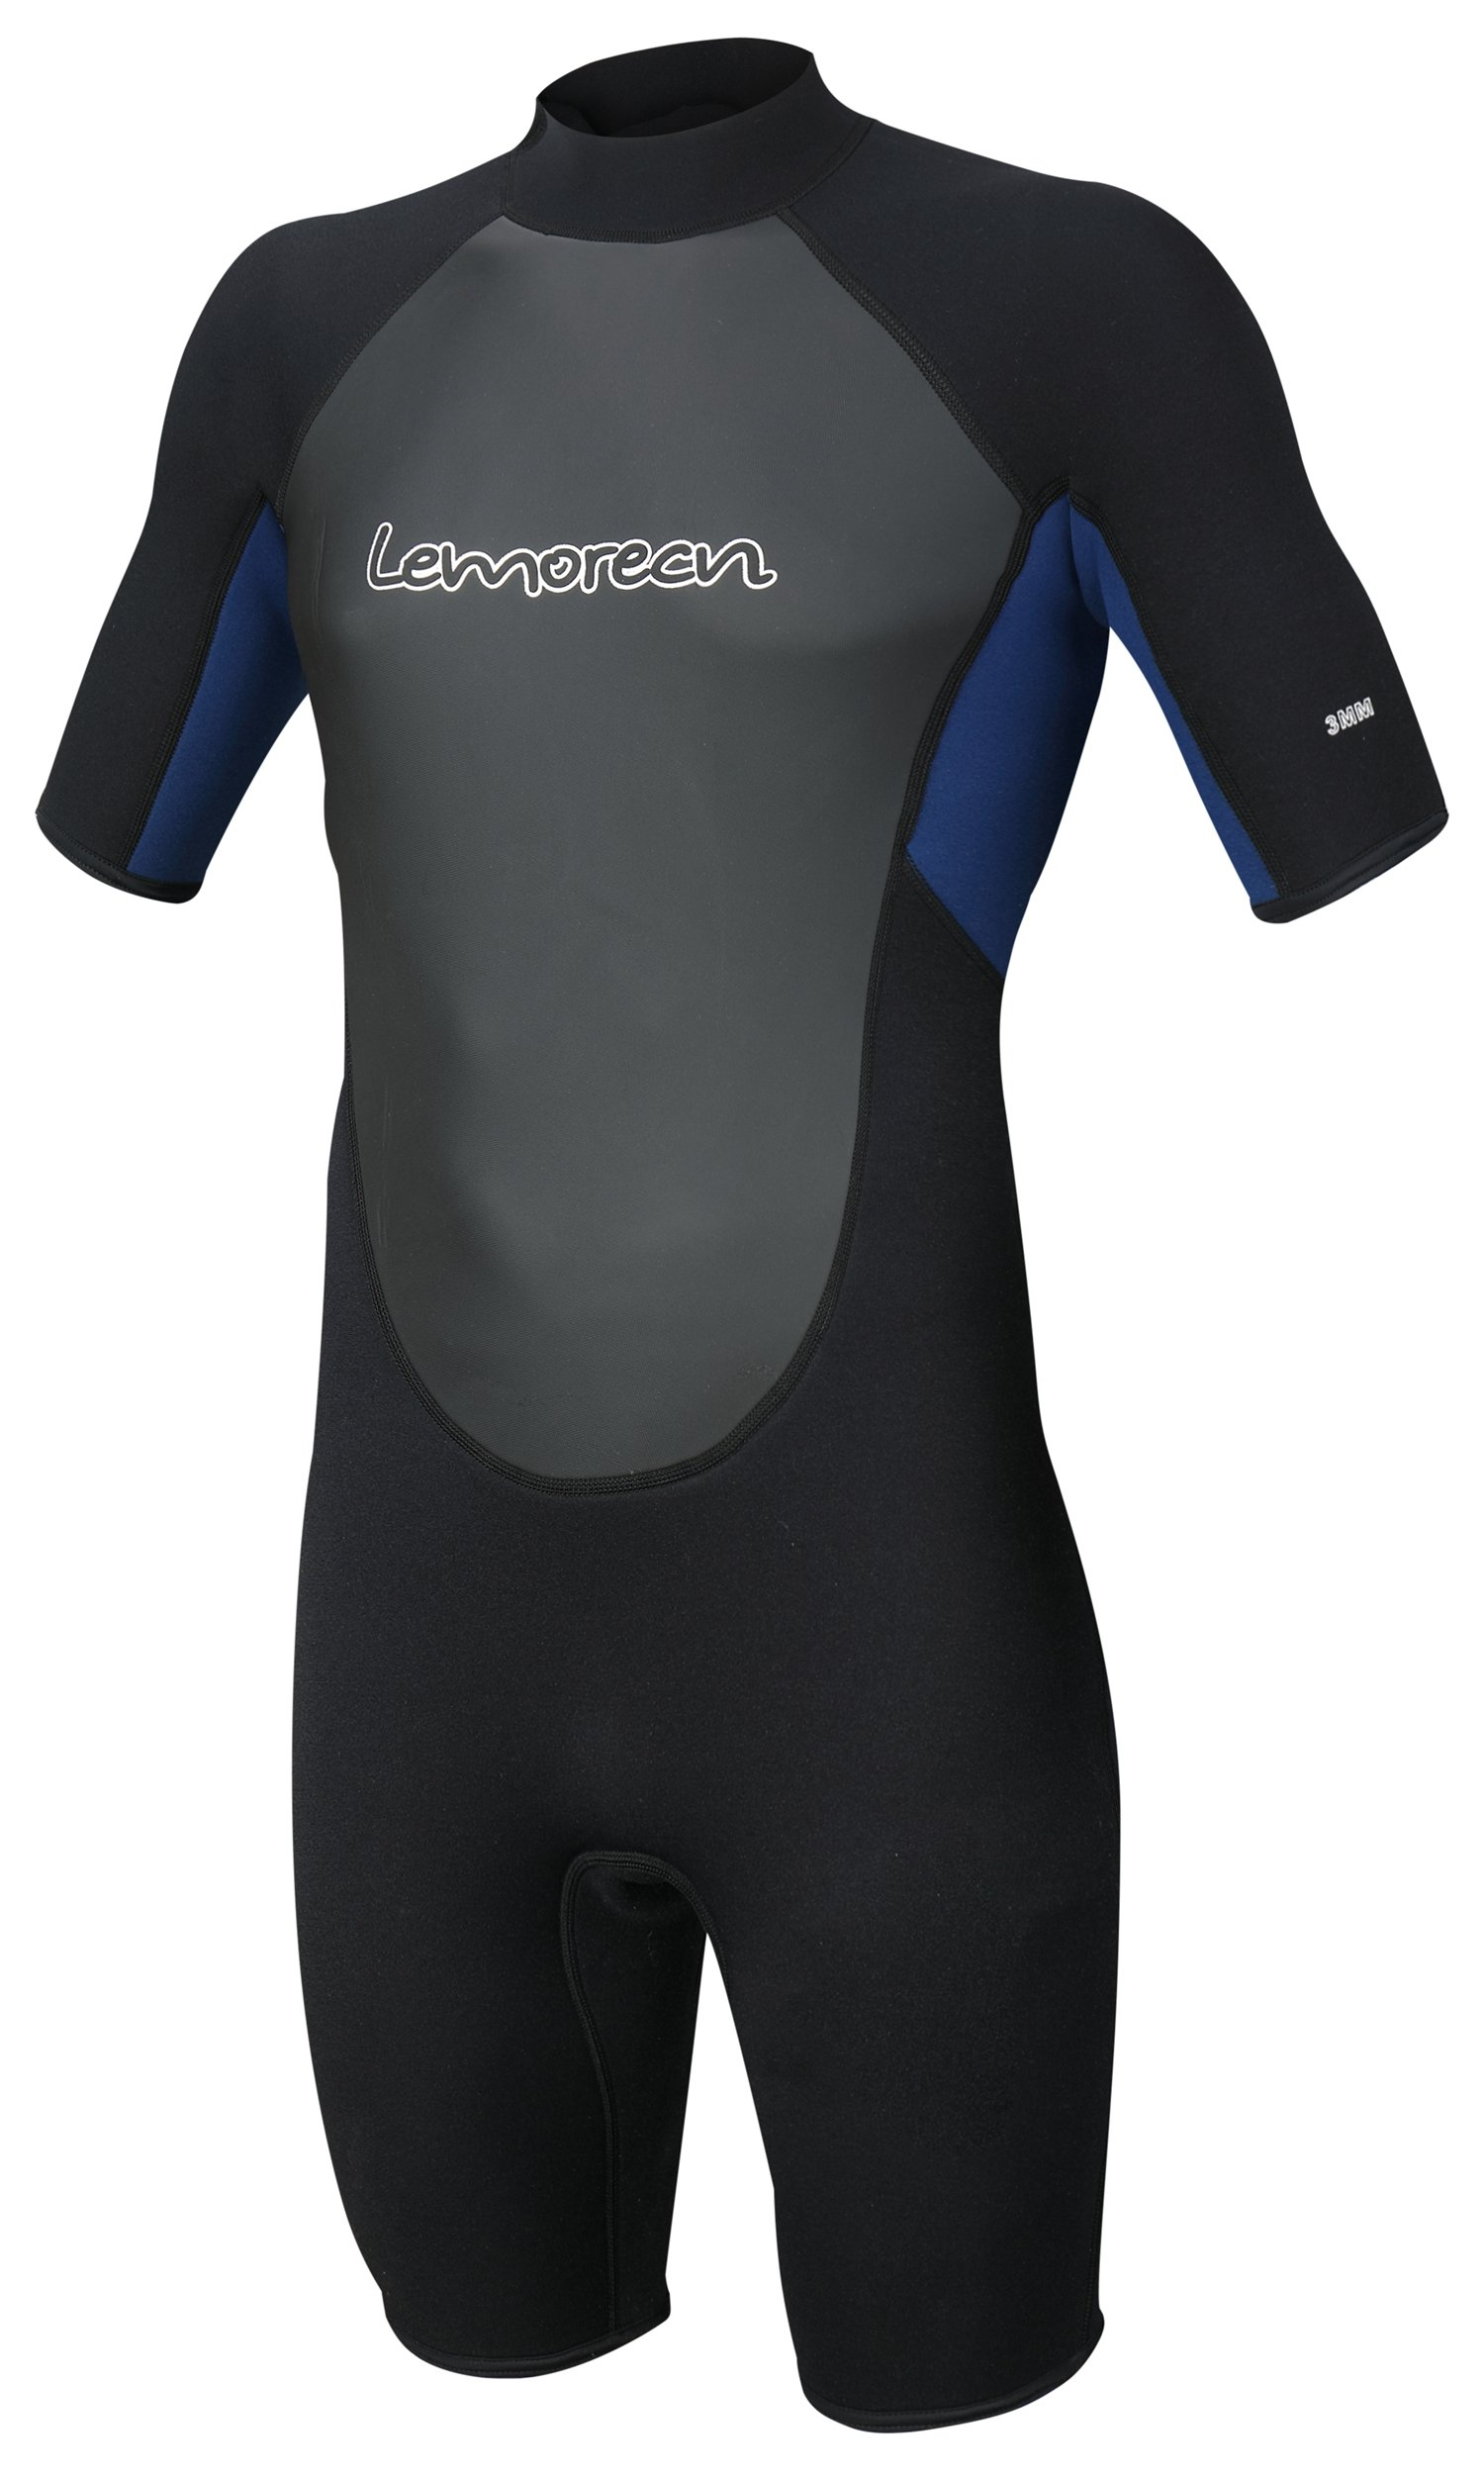 Lemorecn Wetsuits Mens Neoprene 3mm Shorty Diving Suit(3036blackblue-S)